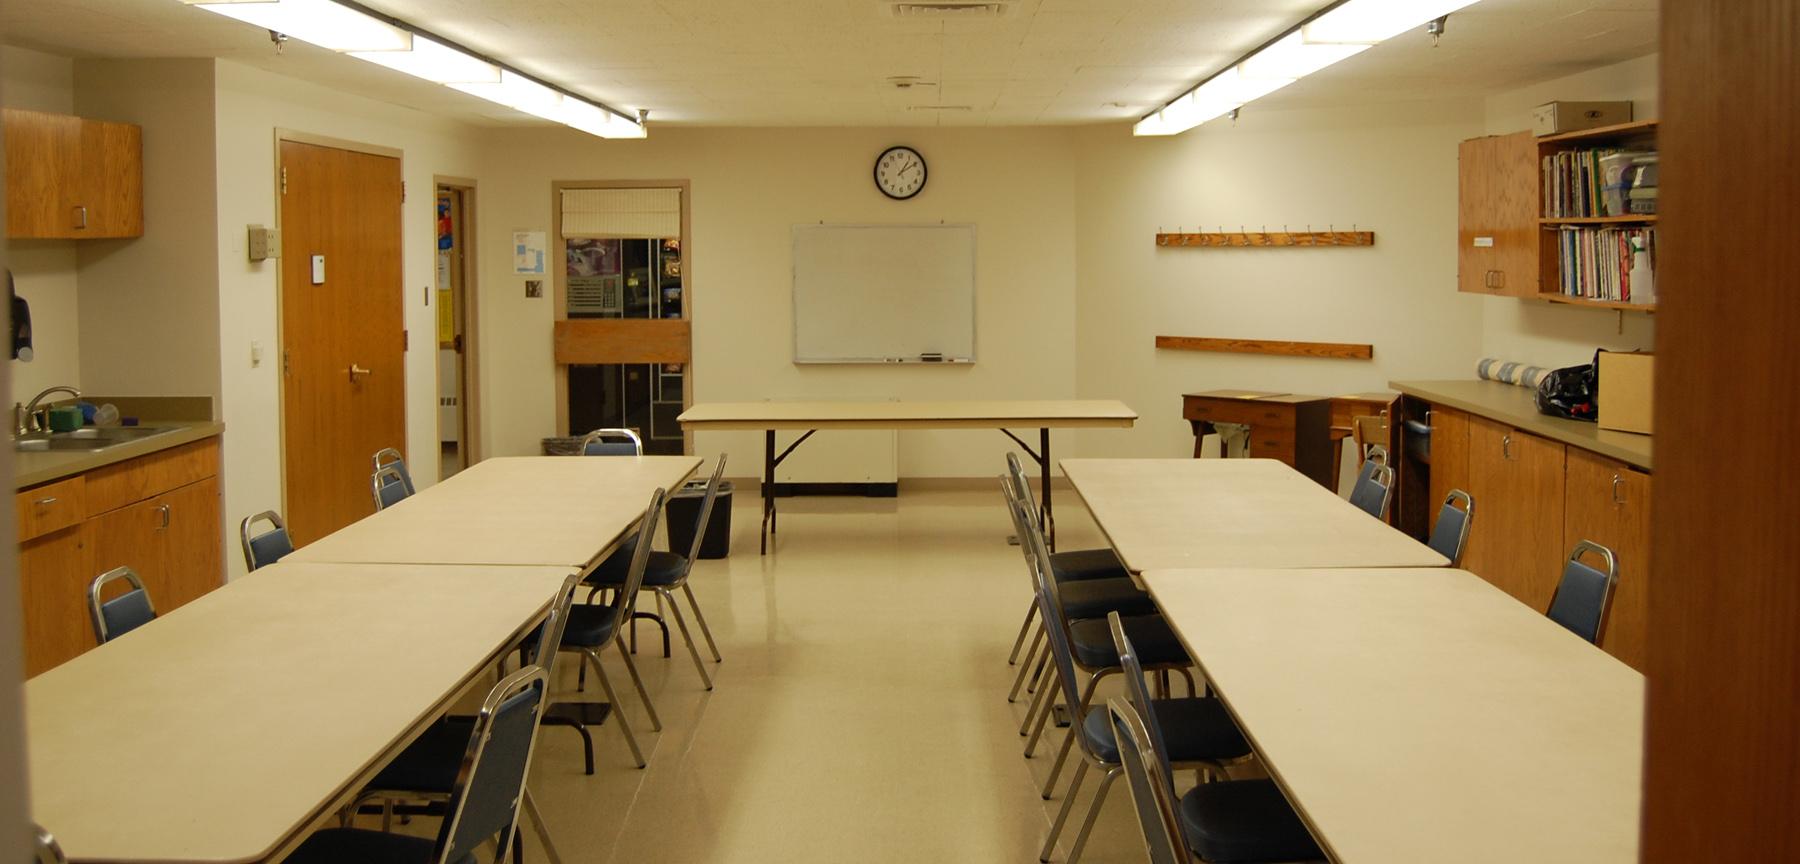 Aurora Senior Center activity room